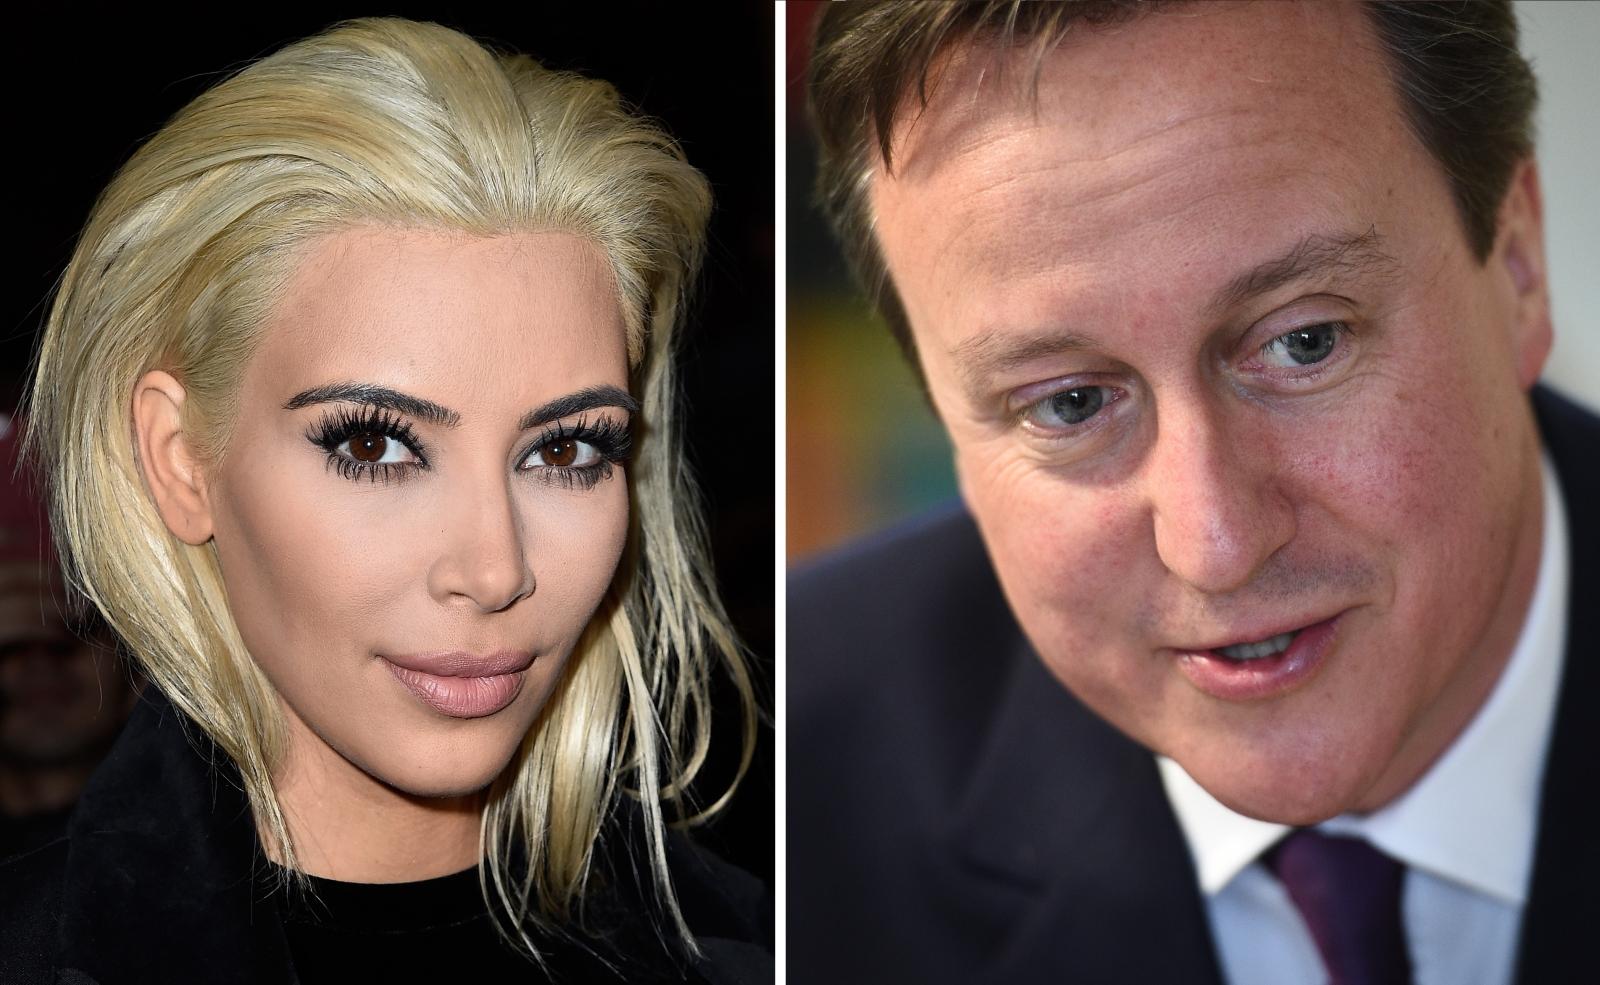 Kim Kardashian David Cameron